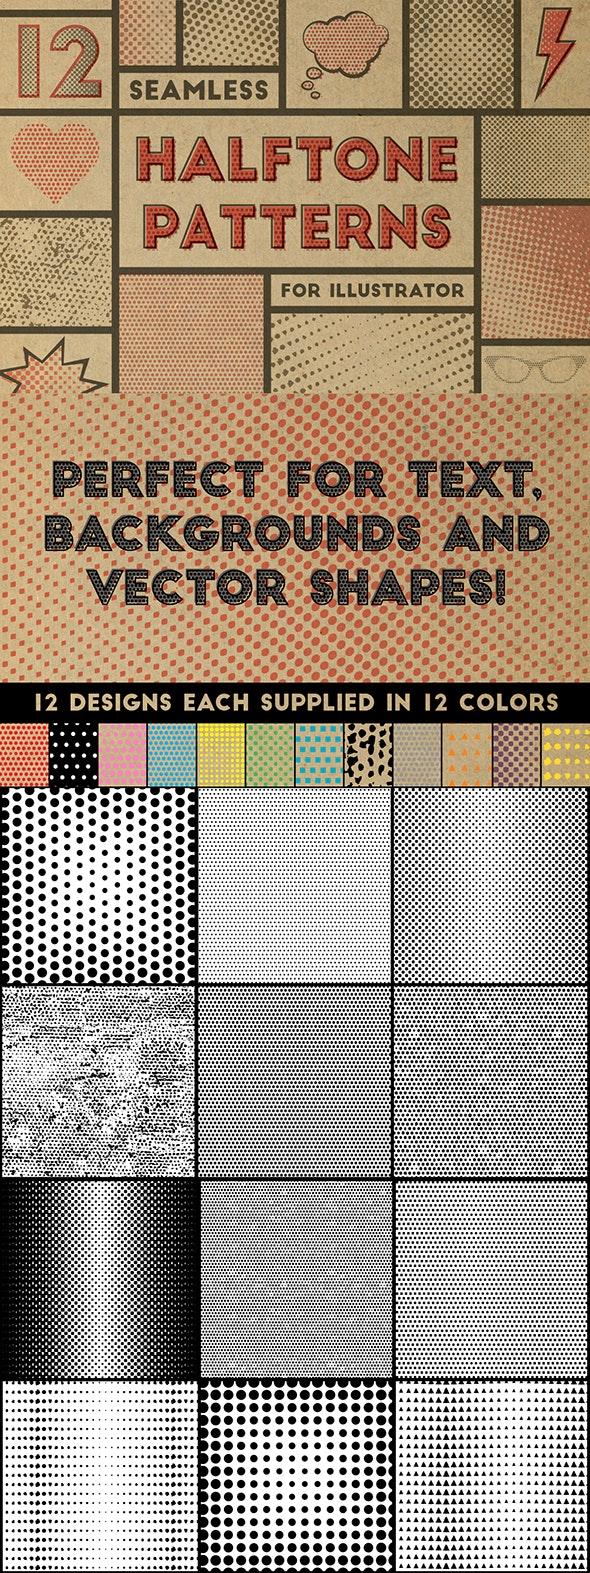 Halftone Patterns - Textures / Fills / Patterns Illustrator